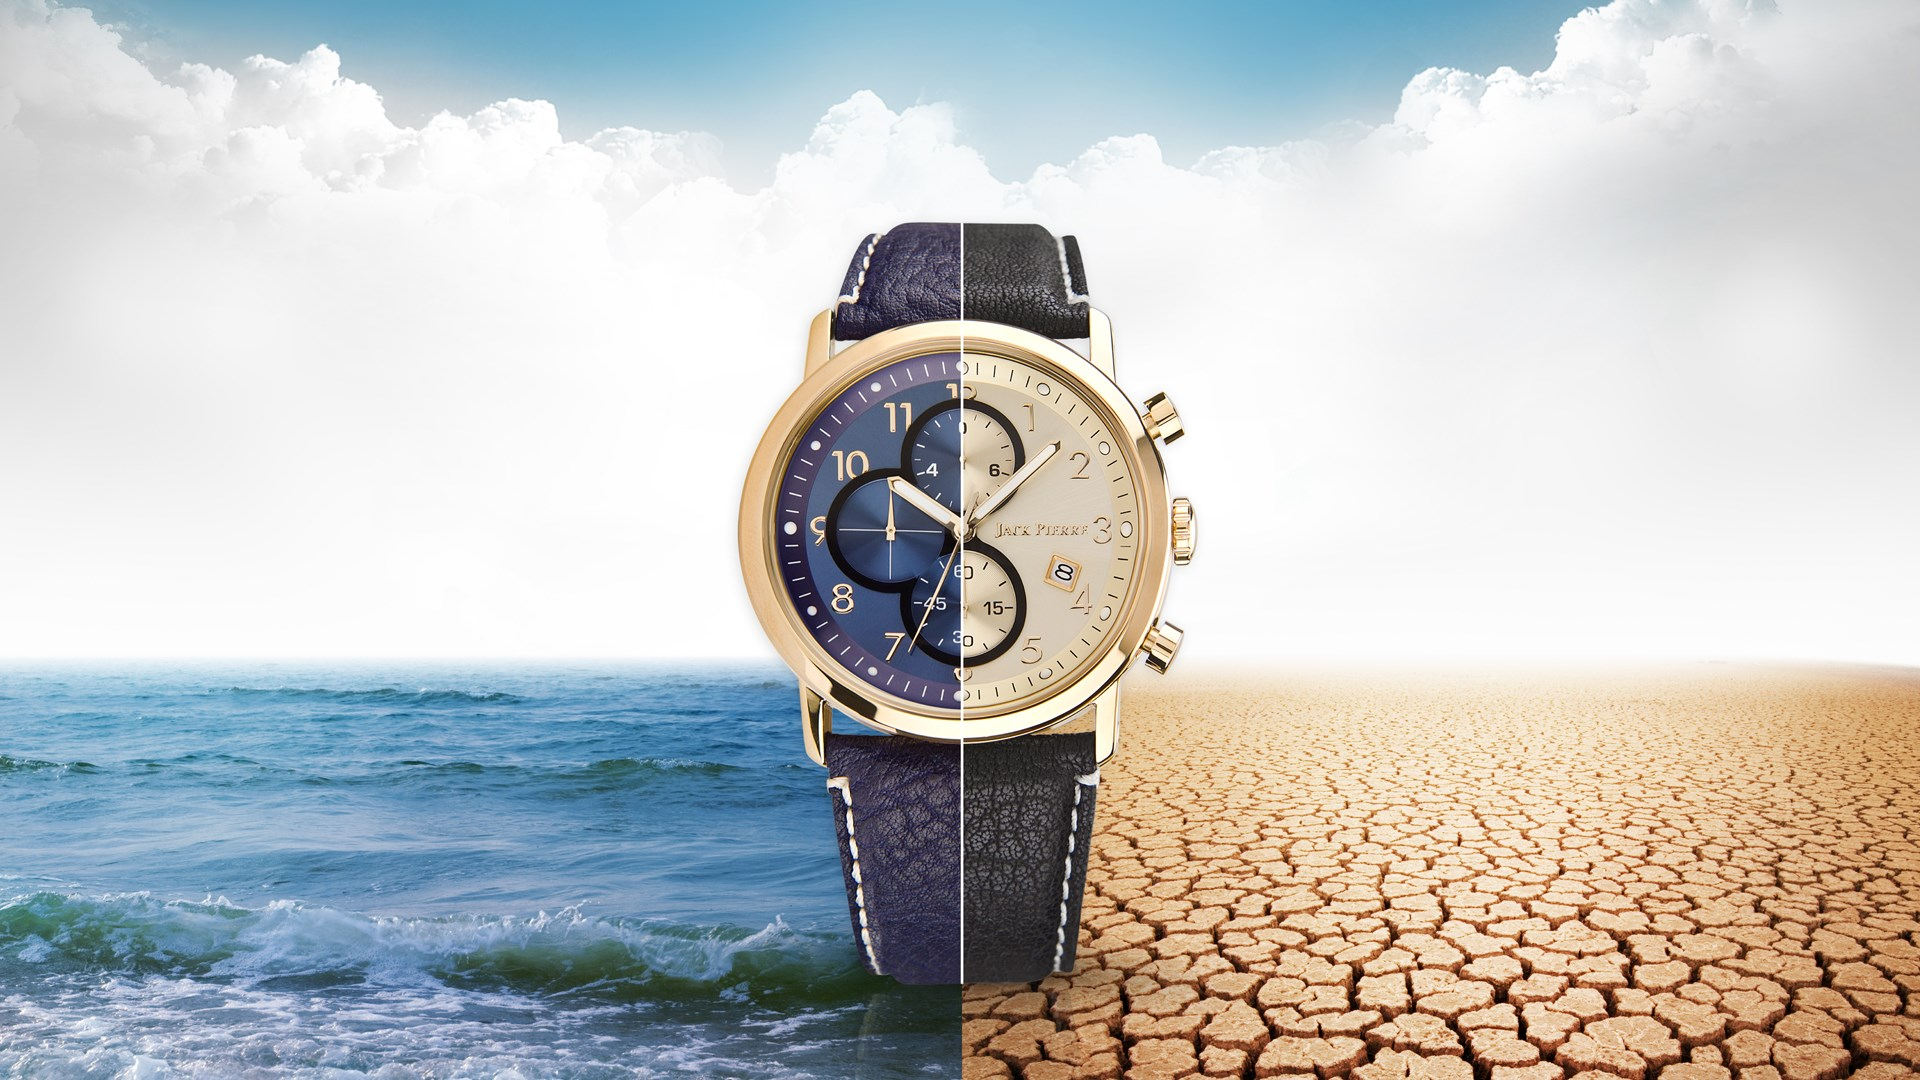 1920x1080-free-desktop-downloads-watch-wallpaper-wp340816